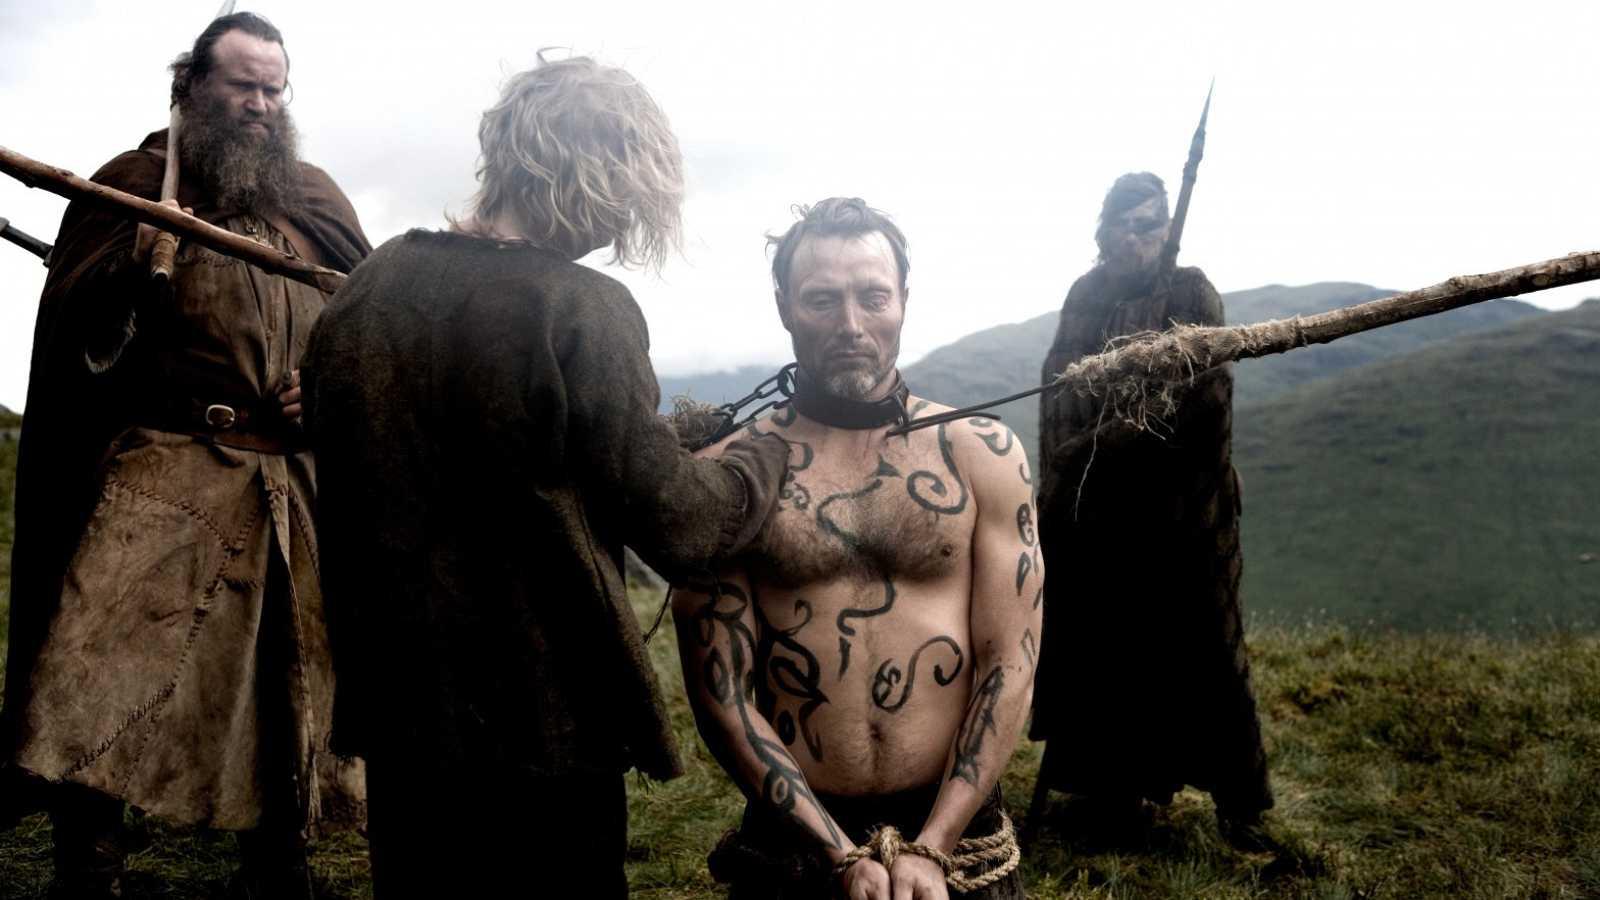 Días de cine -'Valhalla rising'